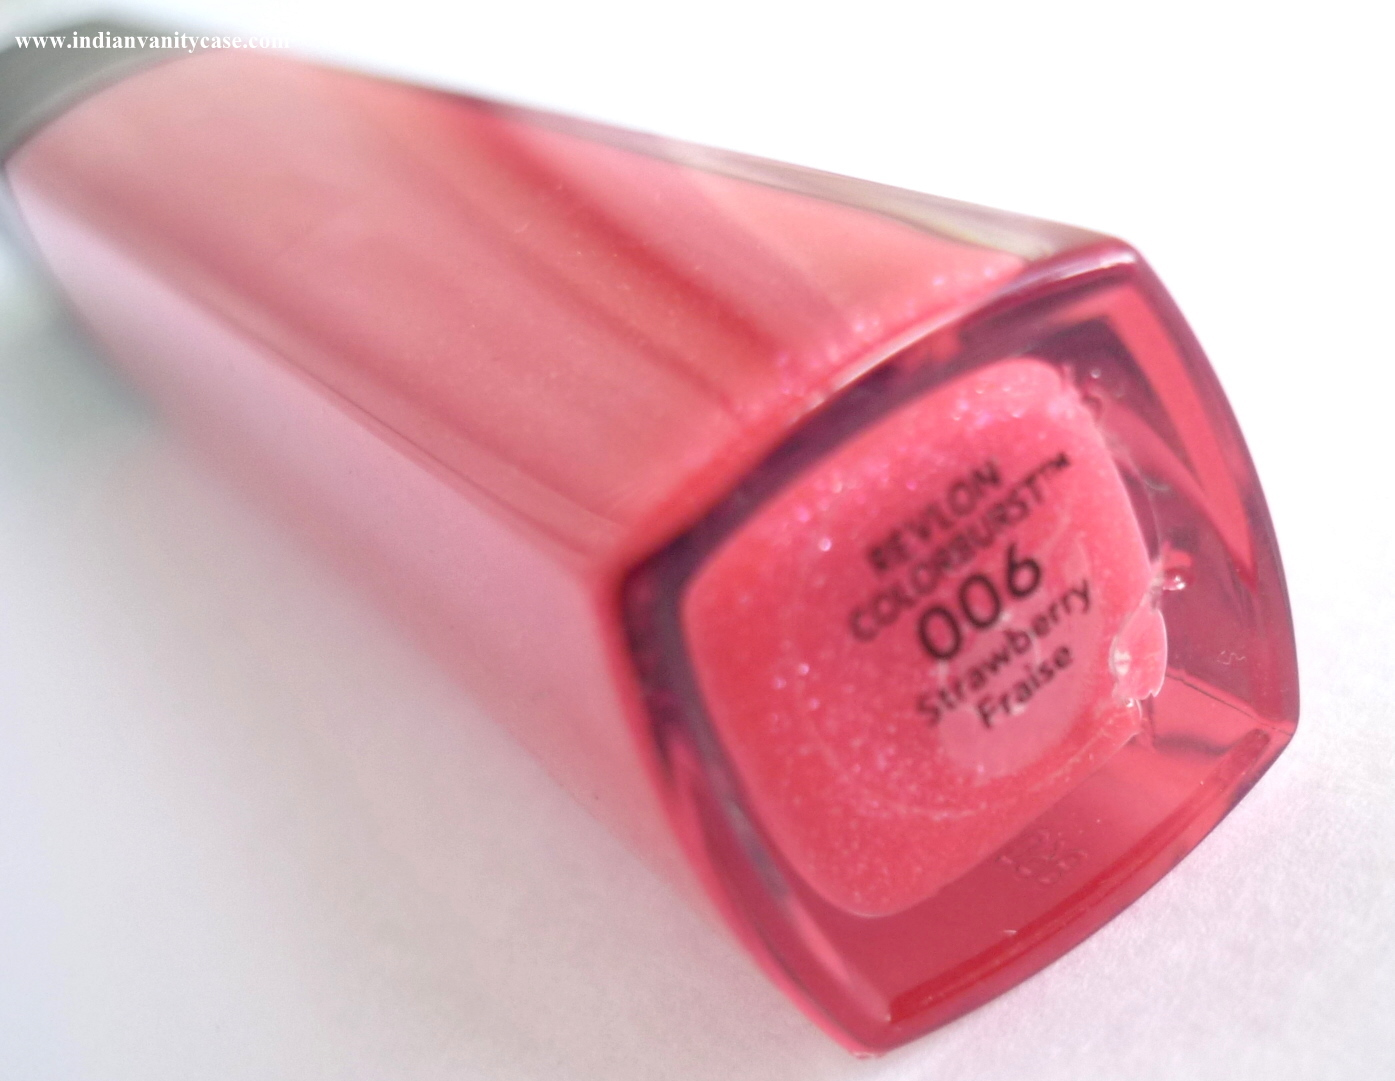 Indian Vanity Case: Revlon Colorburst Lipgloss Strawberry ...